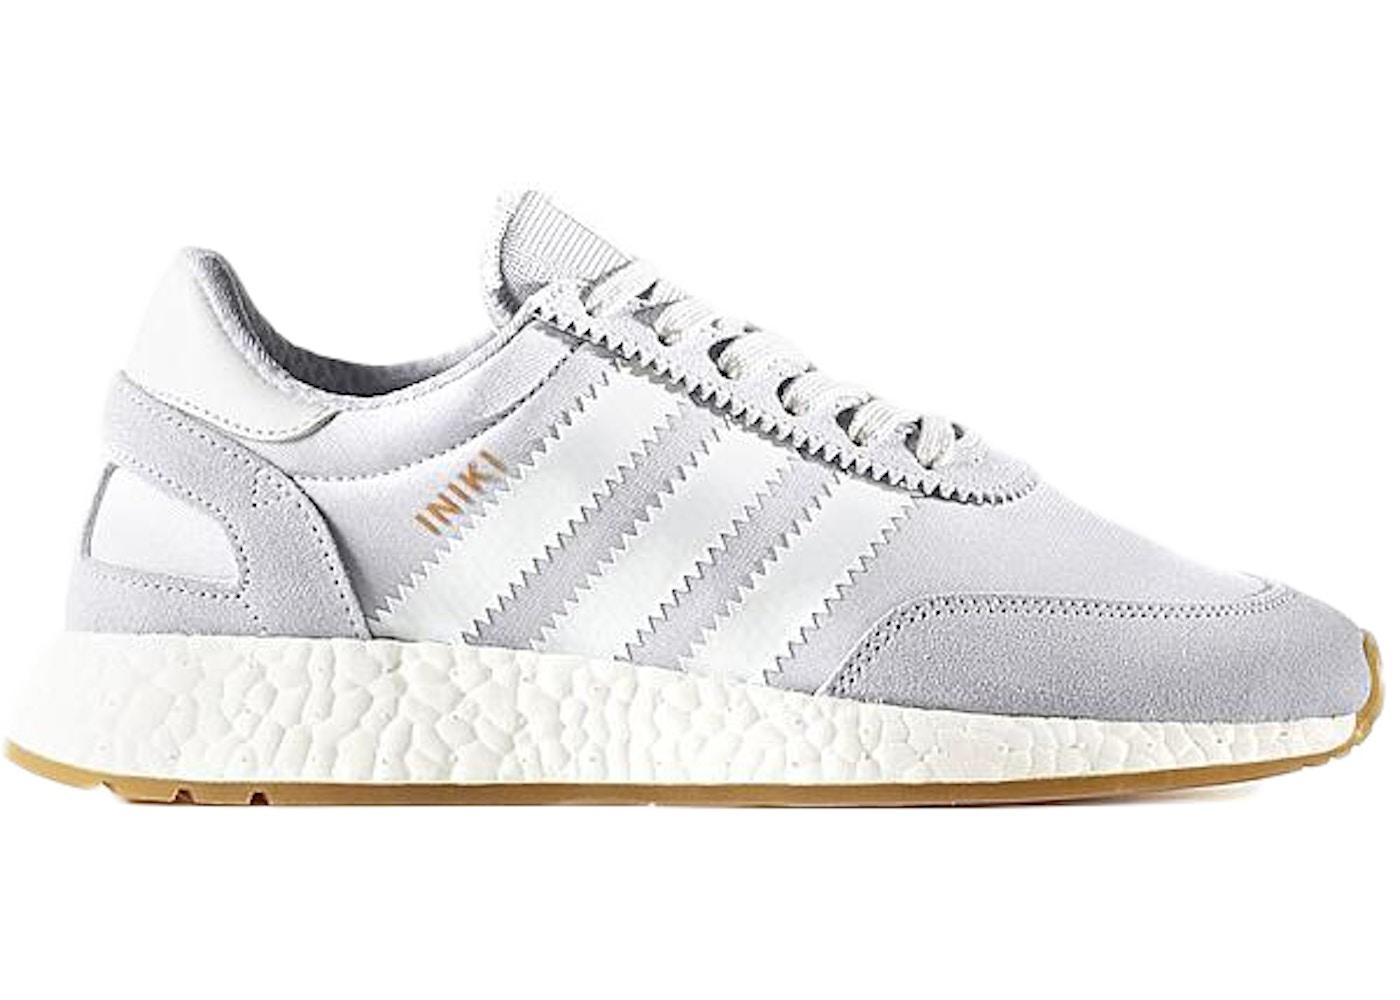 3e56b8a825125 adidas Iniki Runner Grey One Gum (W)